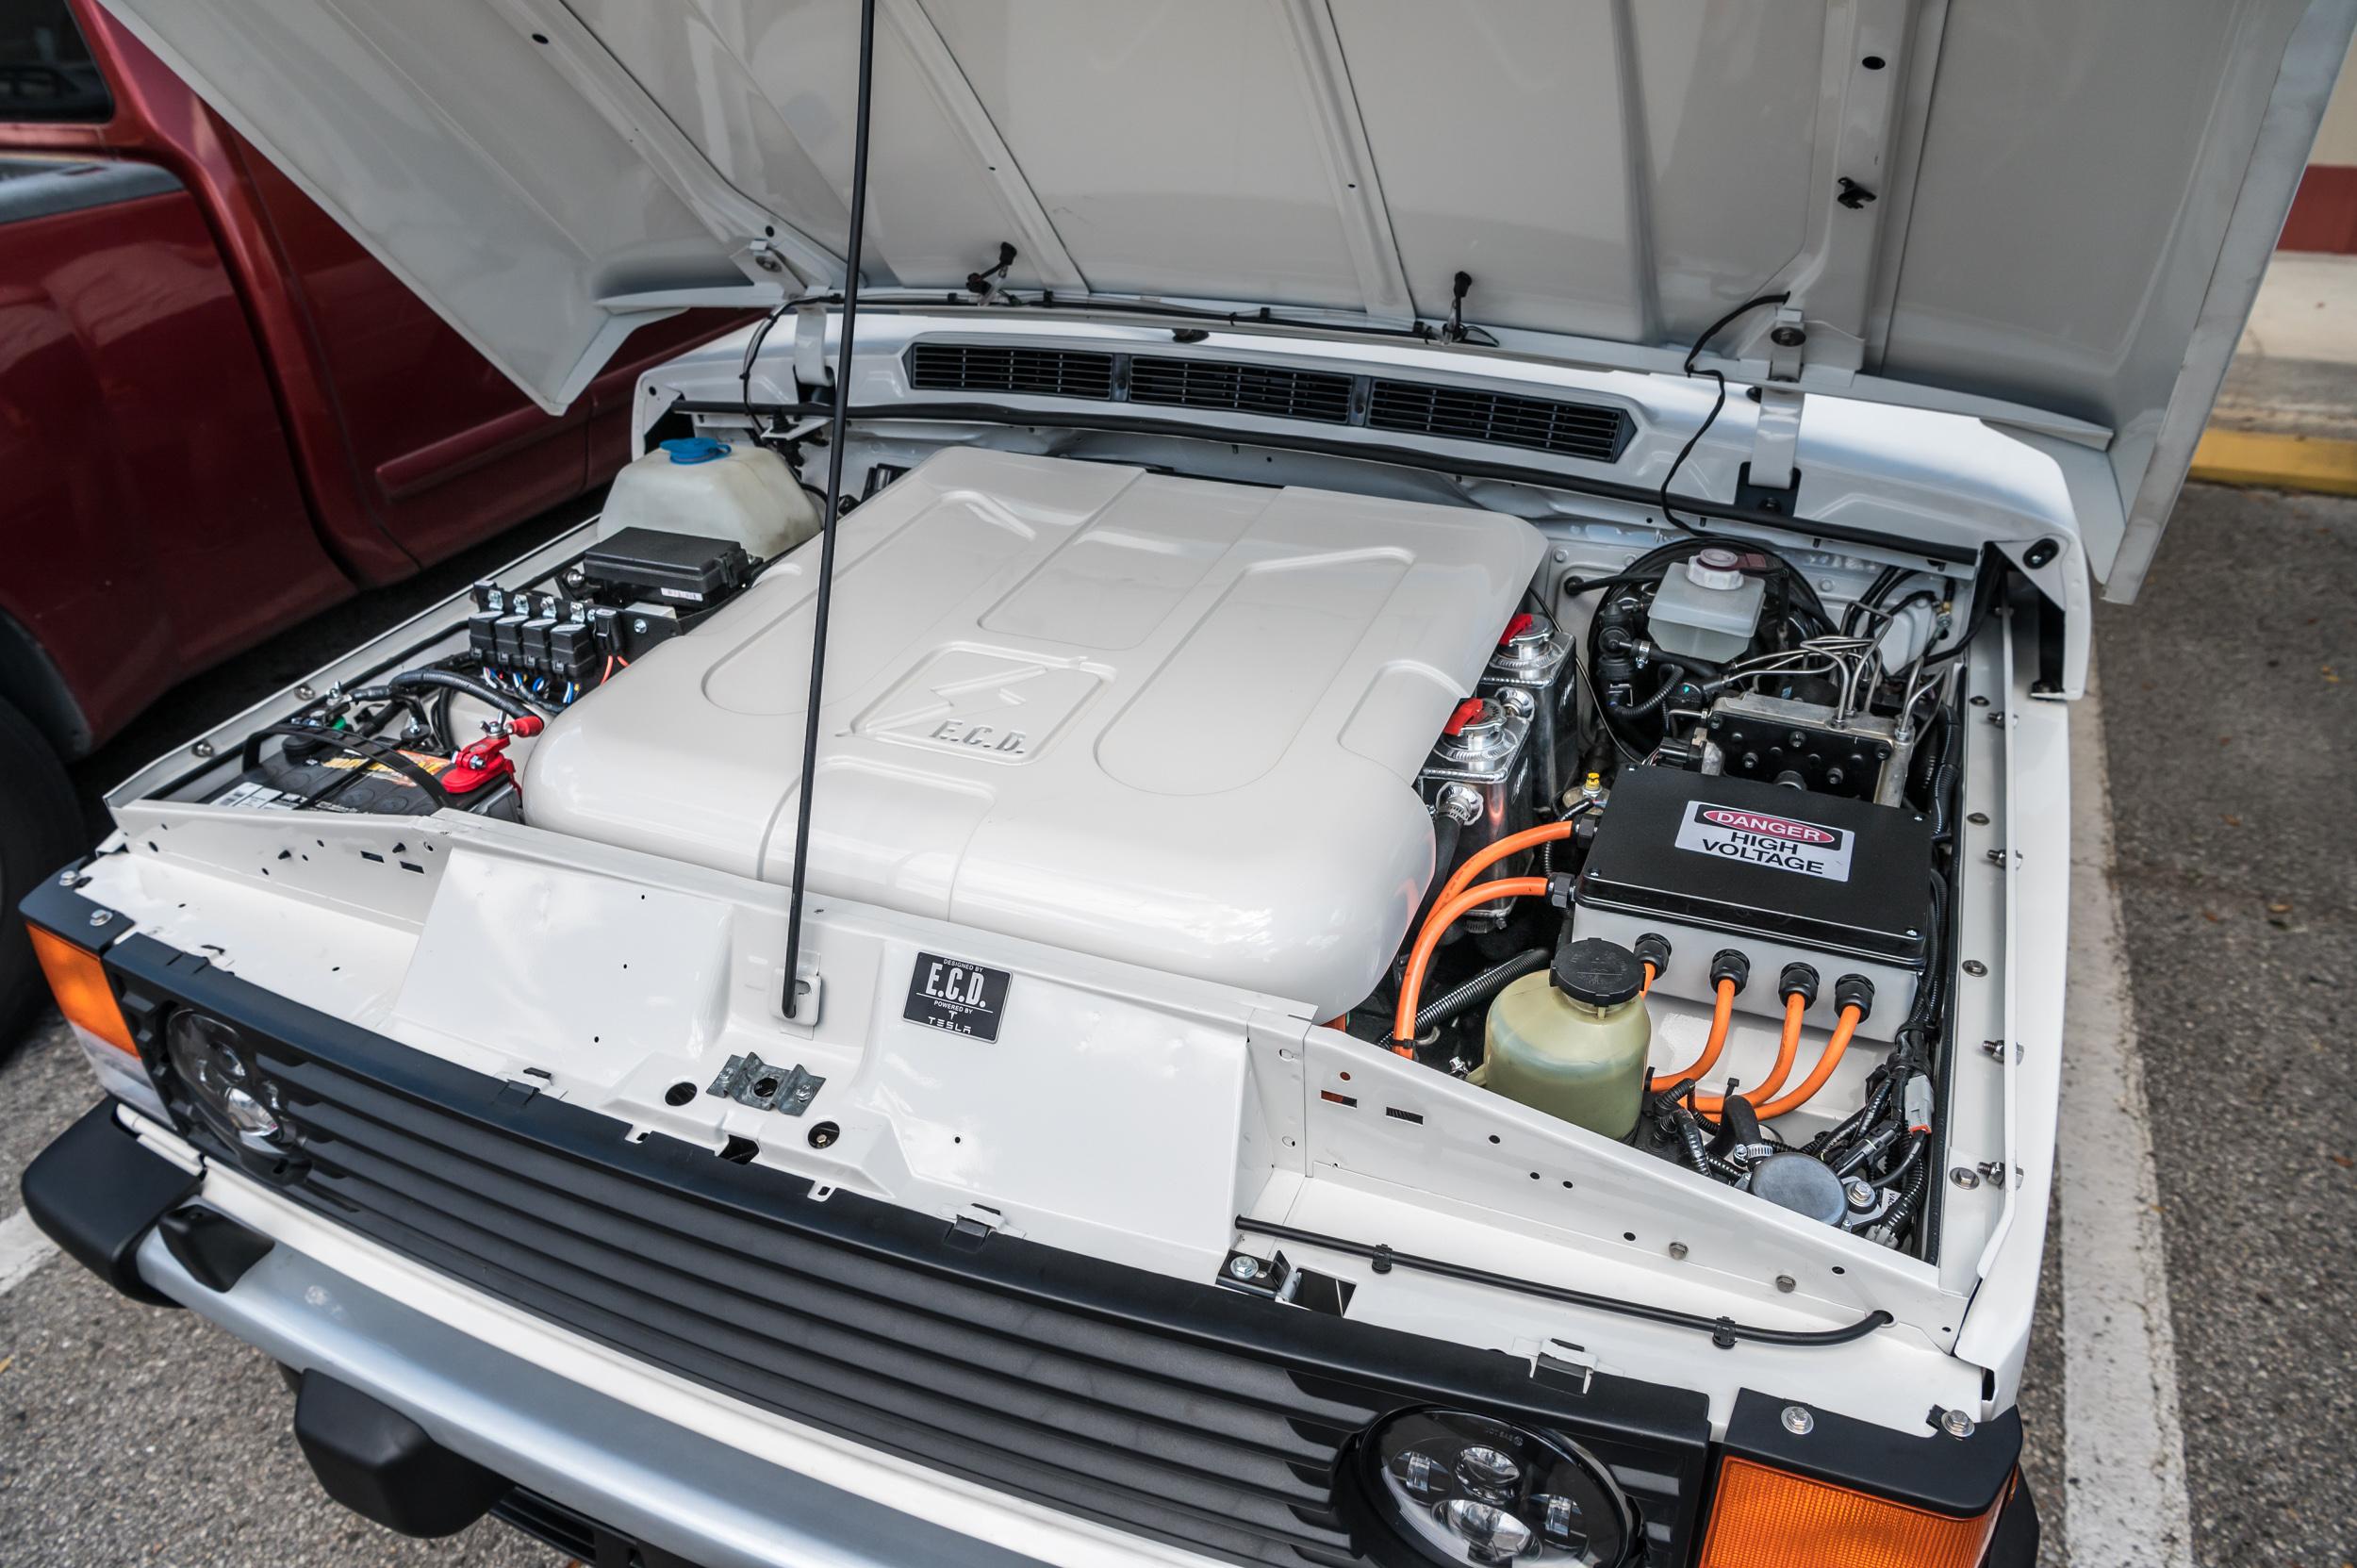 ECD electric RRC under hood battery pack